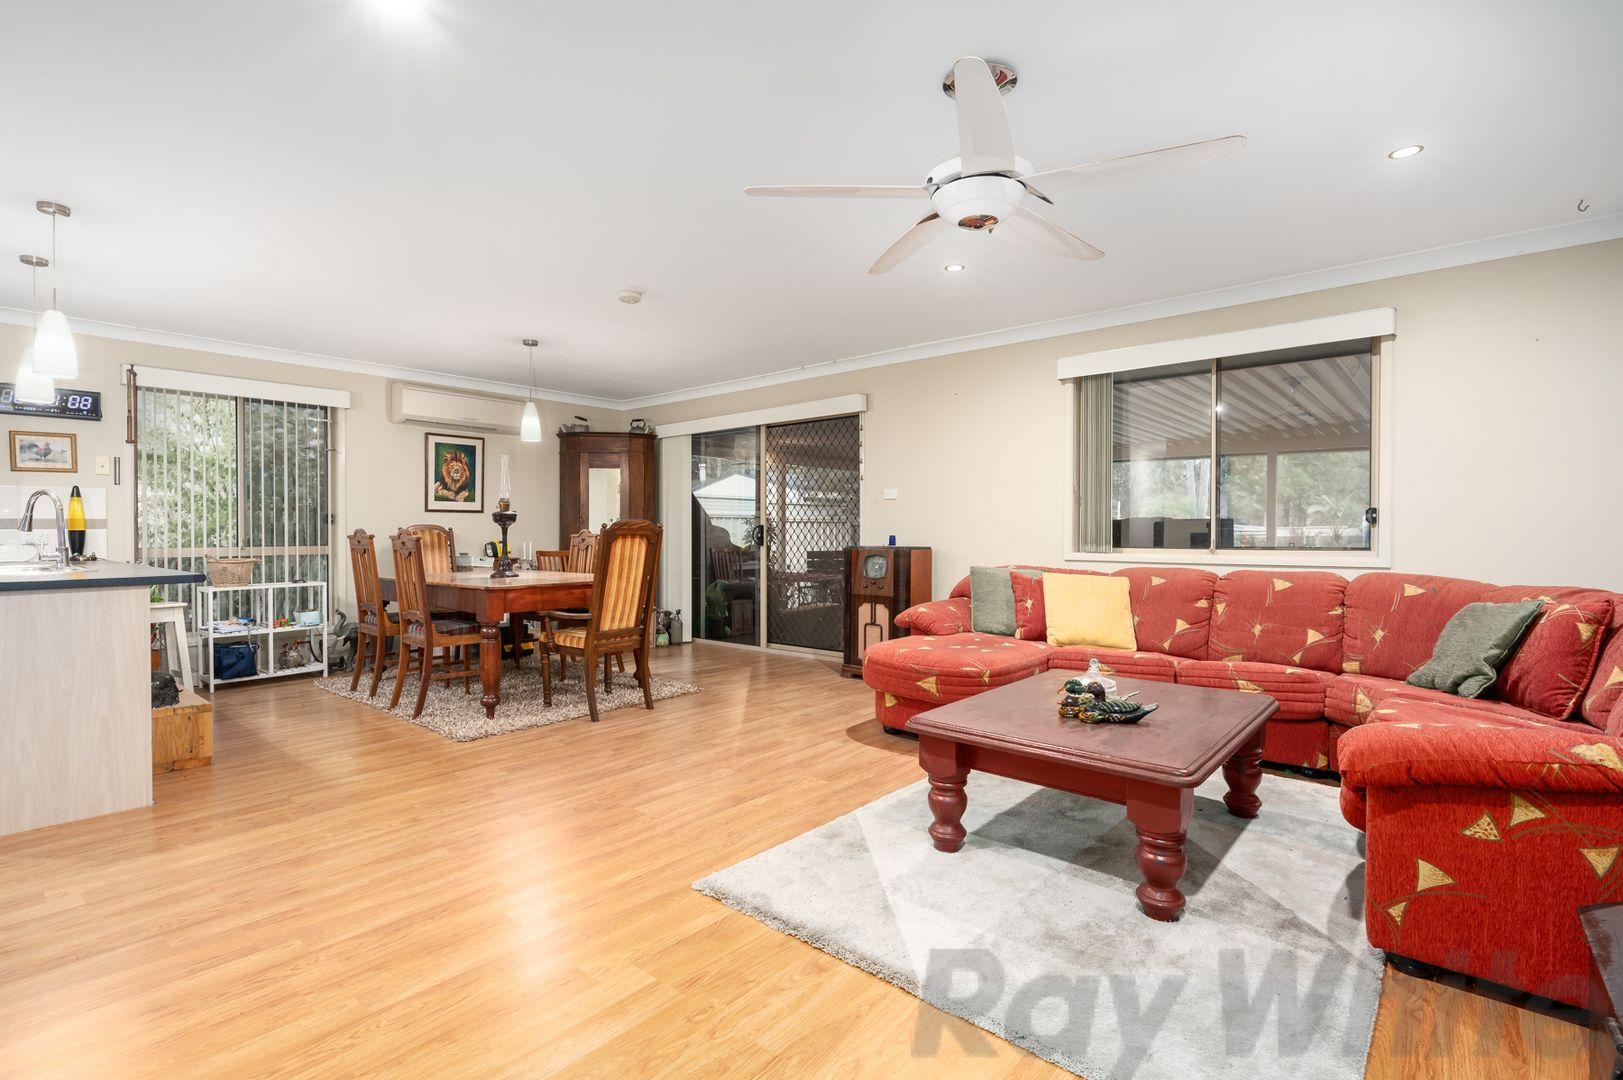 9 Stroud Street, Allworth Via, Stroud NSW 2425, Image 2